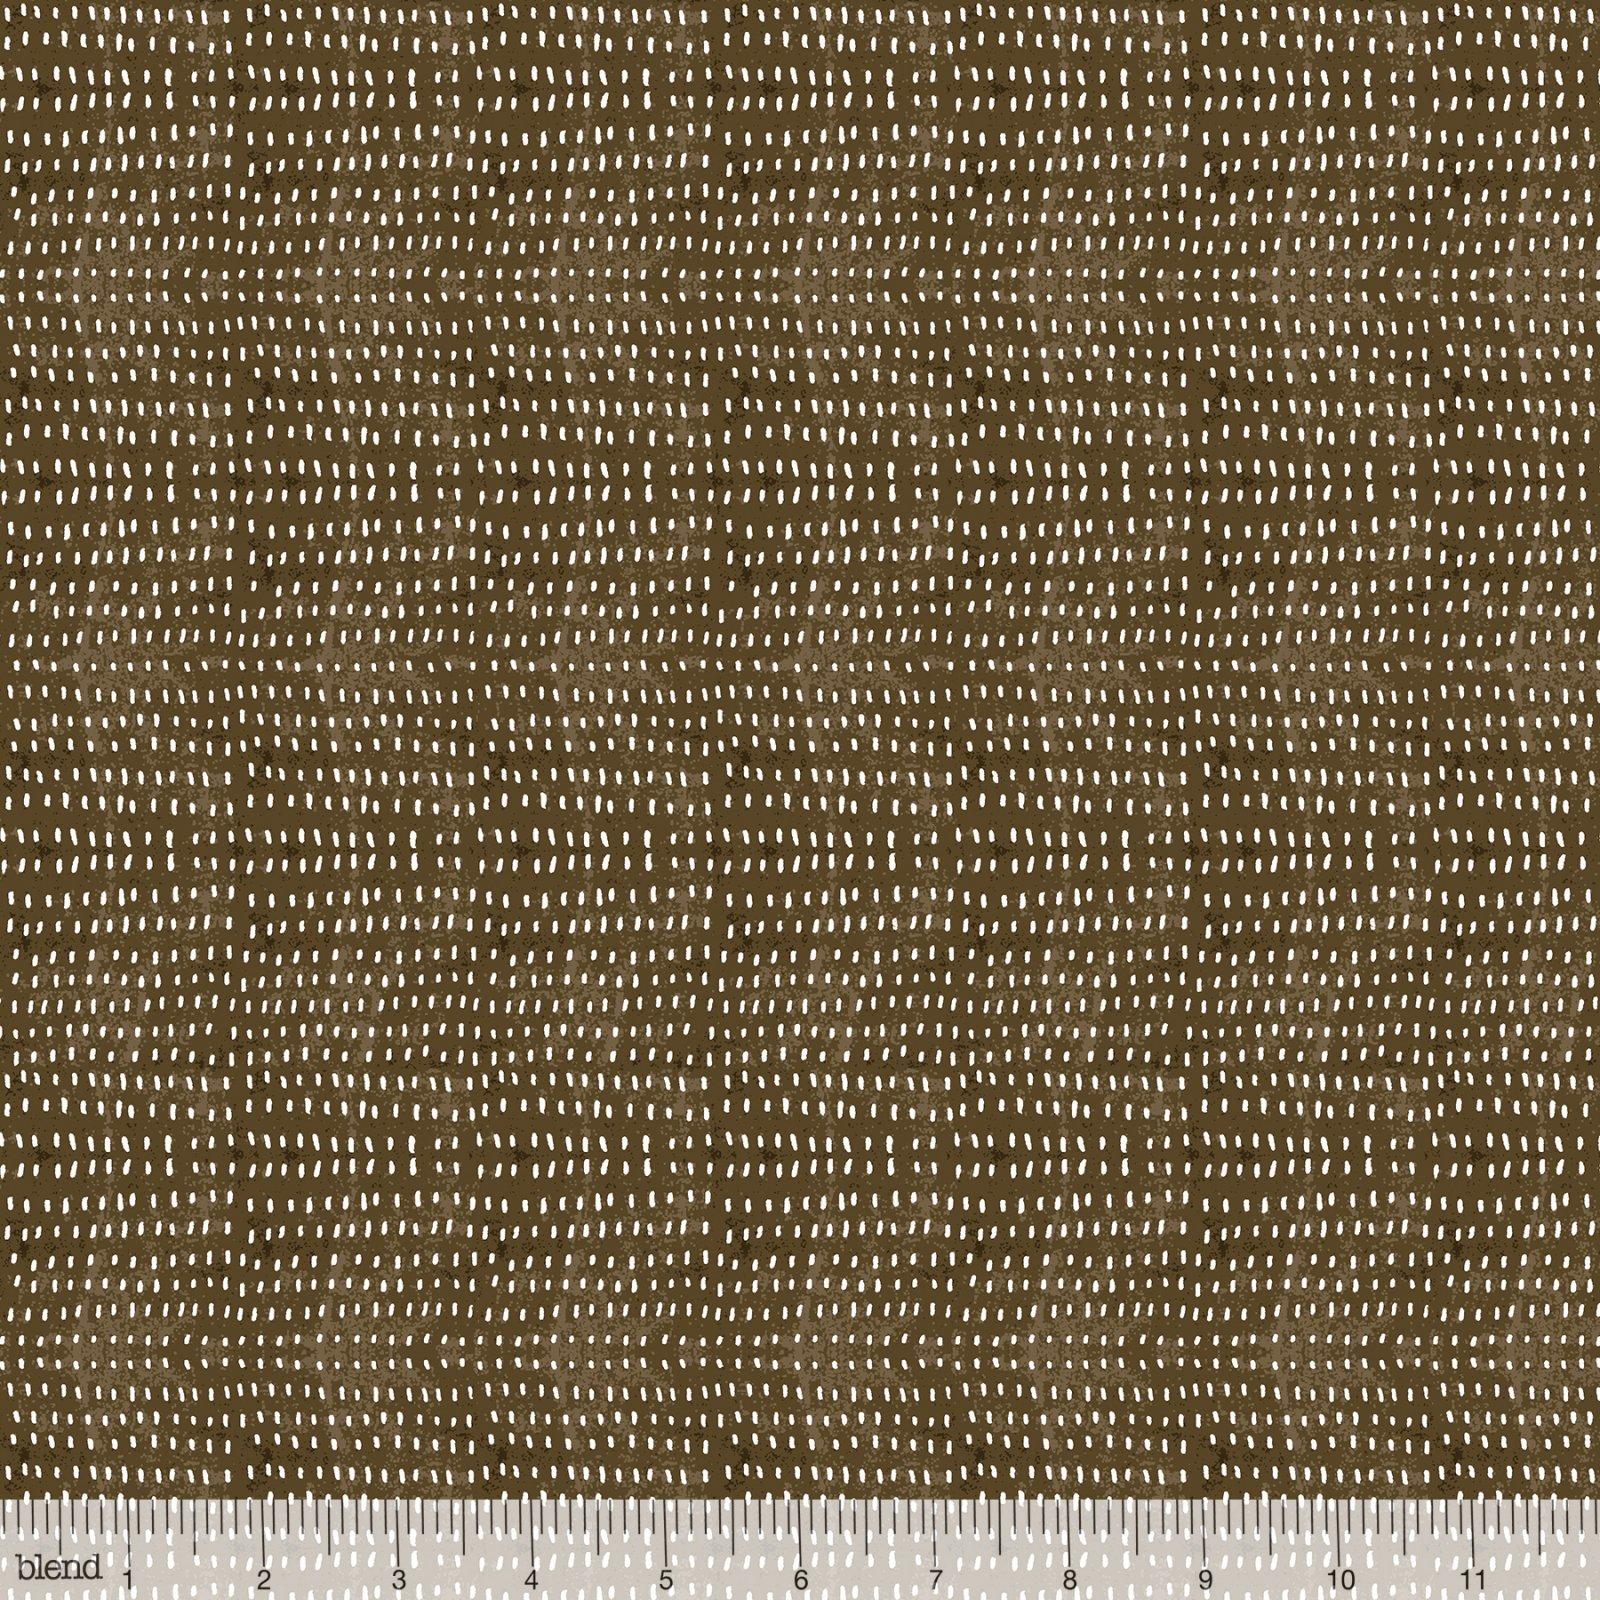 112.114.14 Cappucino Seeds Cori Dantini Blend Fabrics